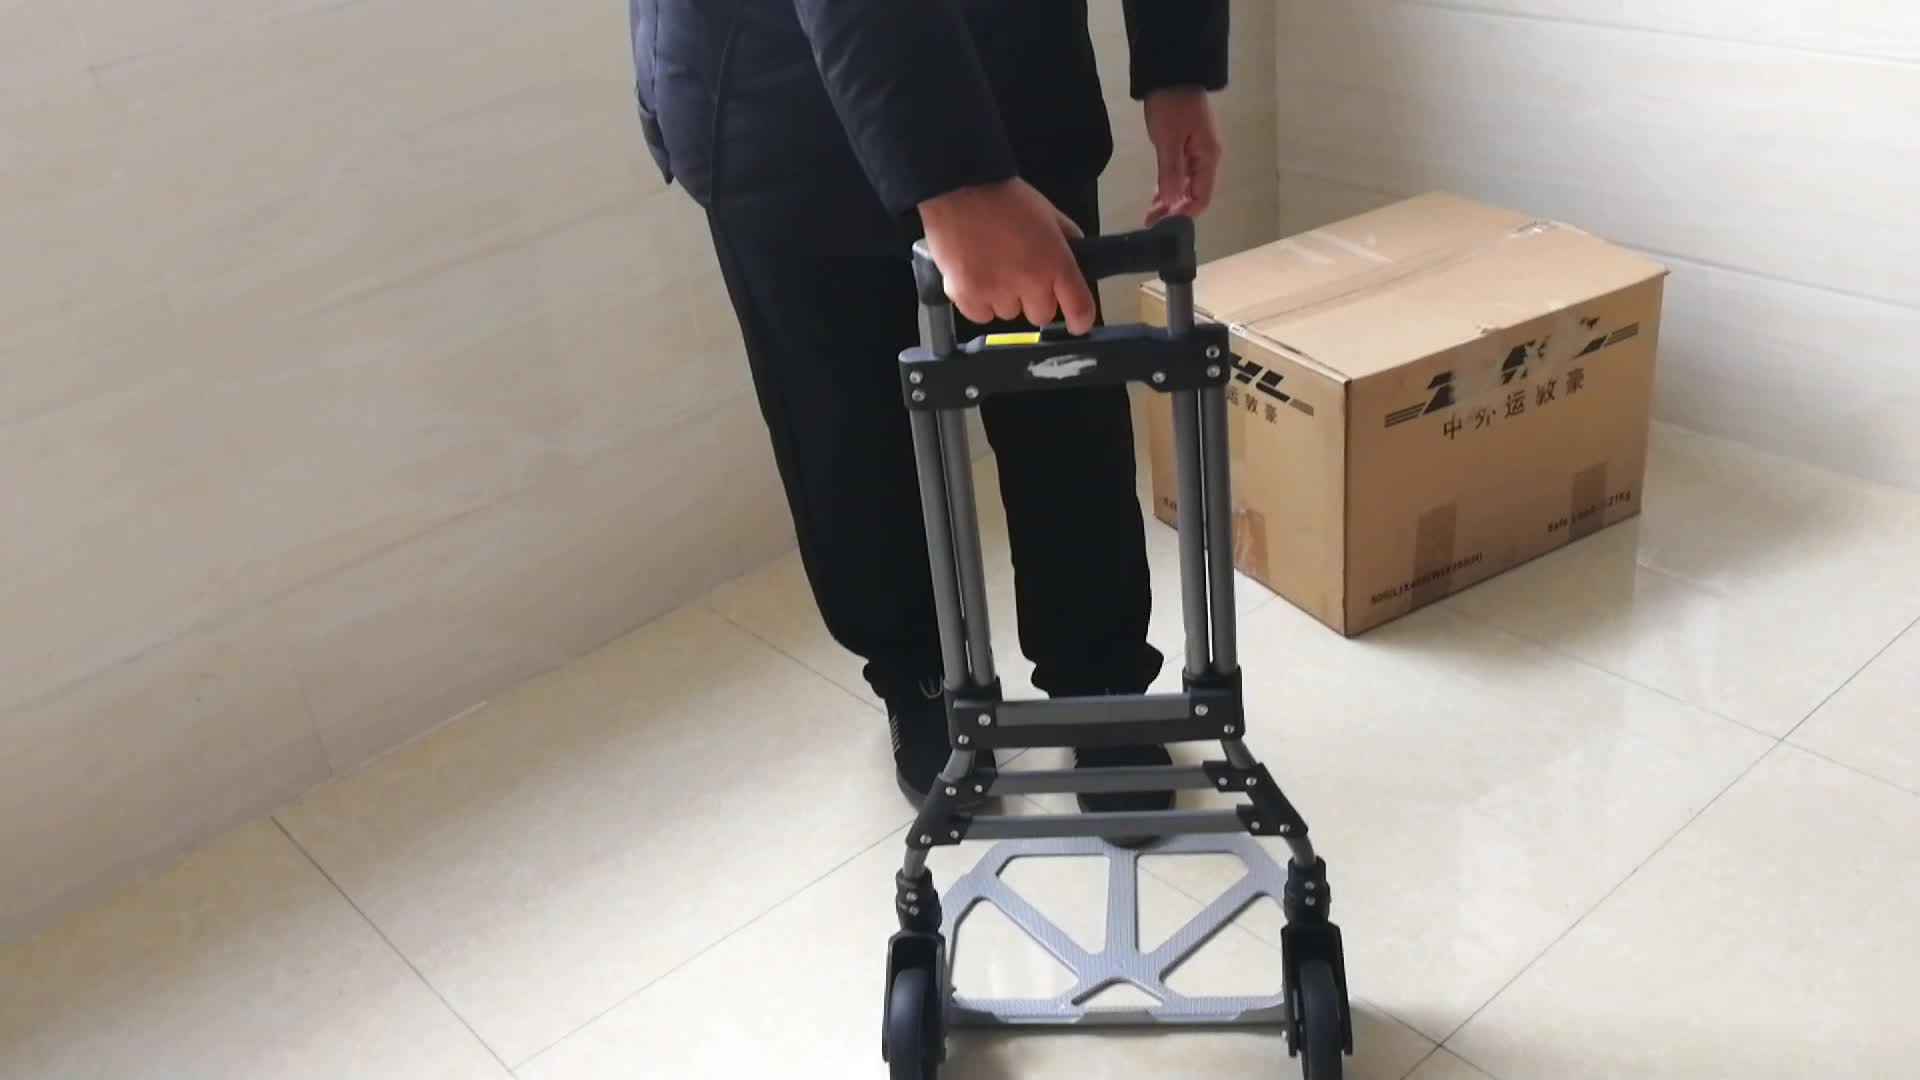 Two-wheel 90 Kgs load capacity foldable hand trolley folding luggage cart